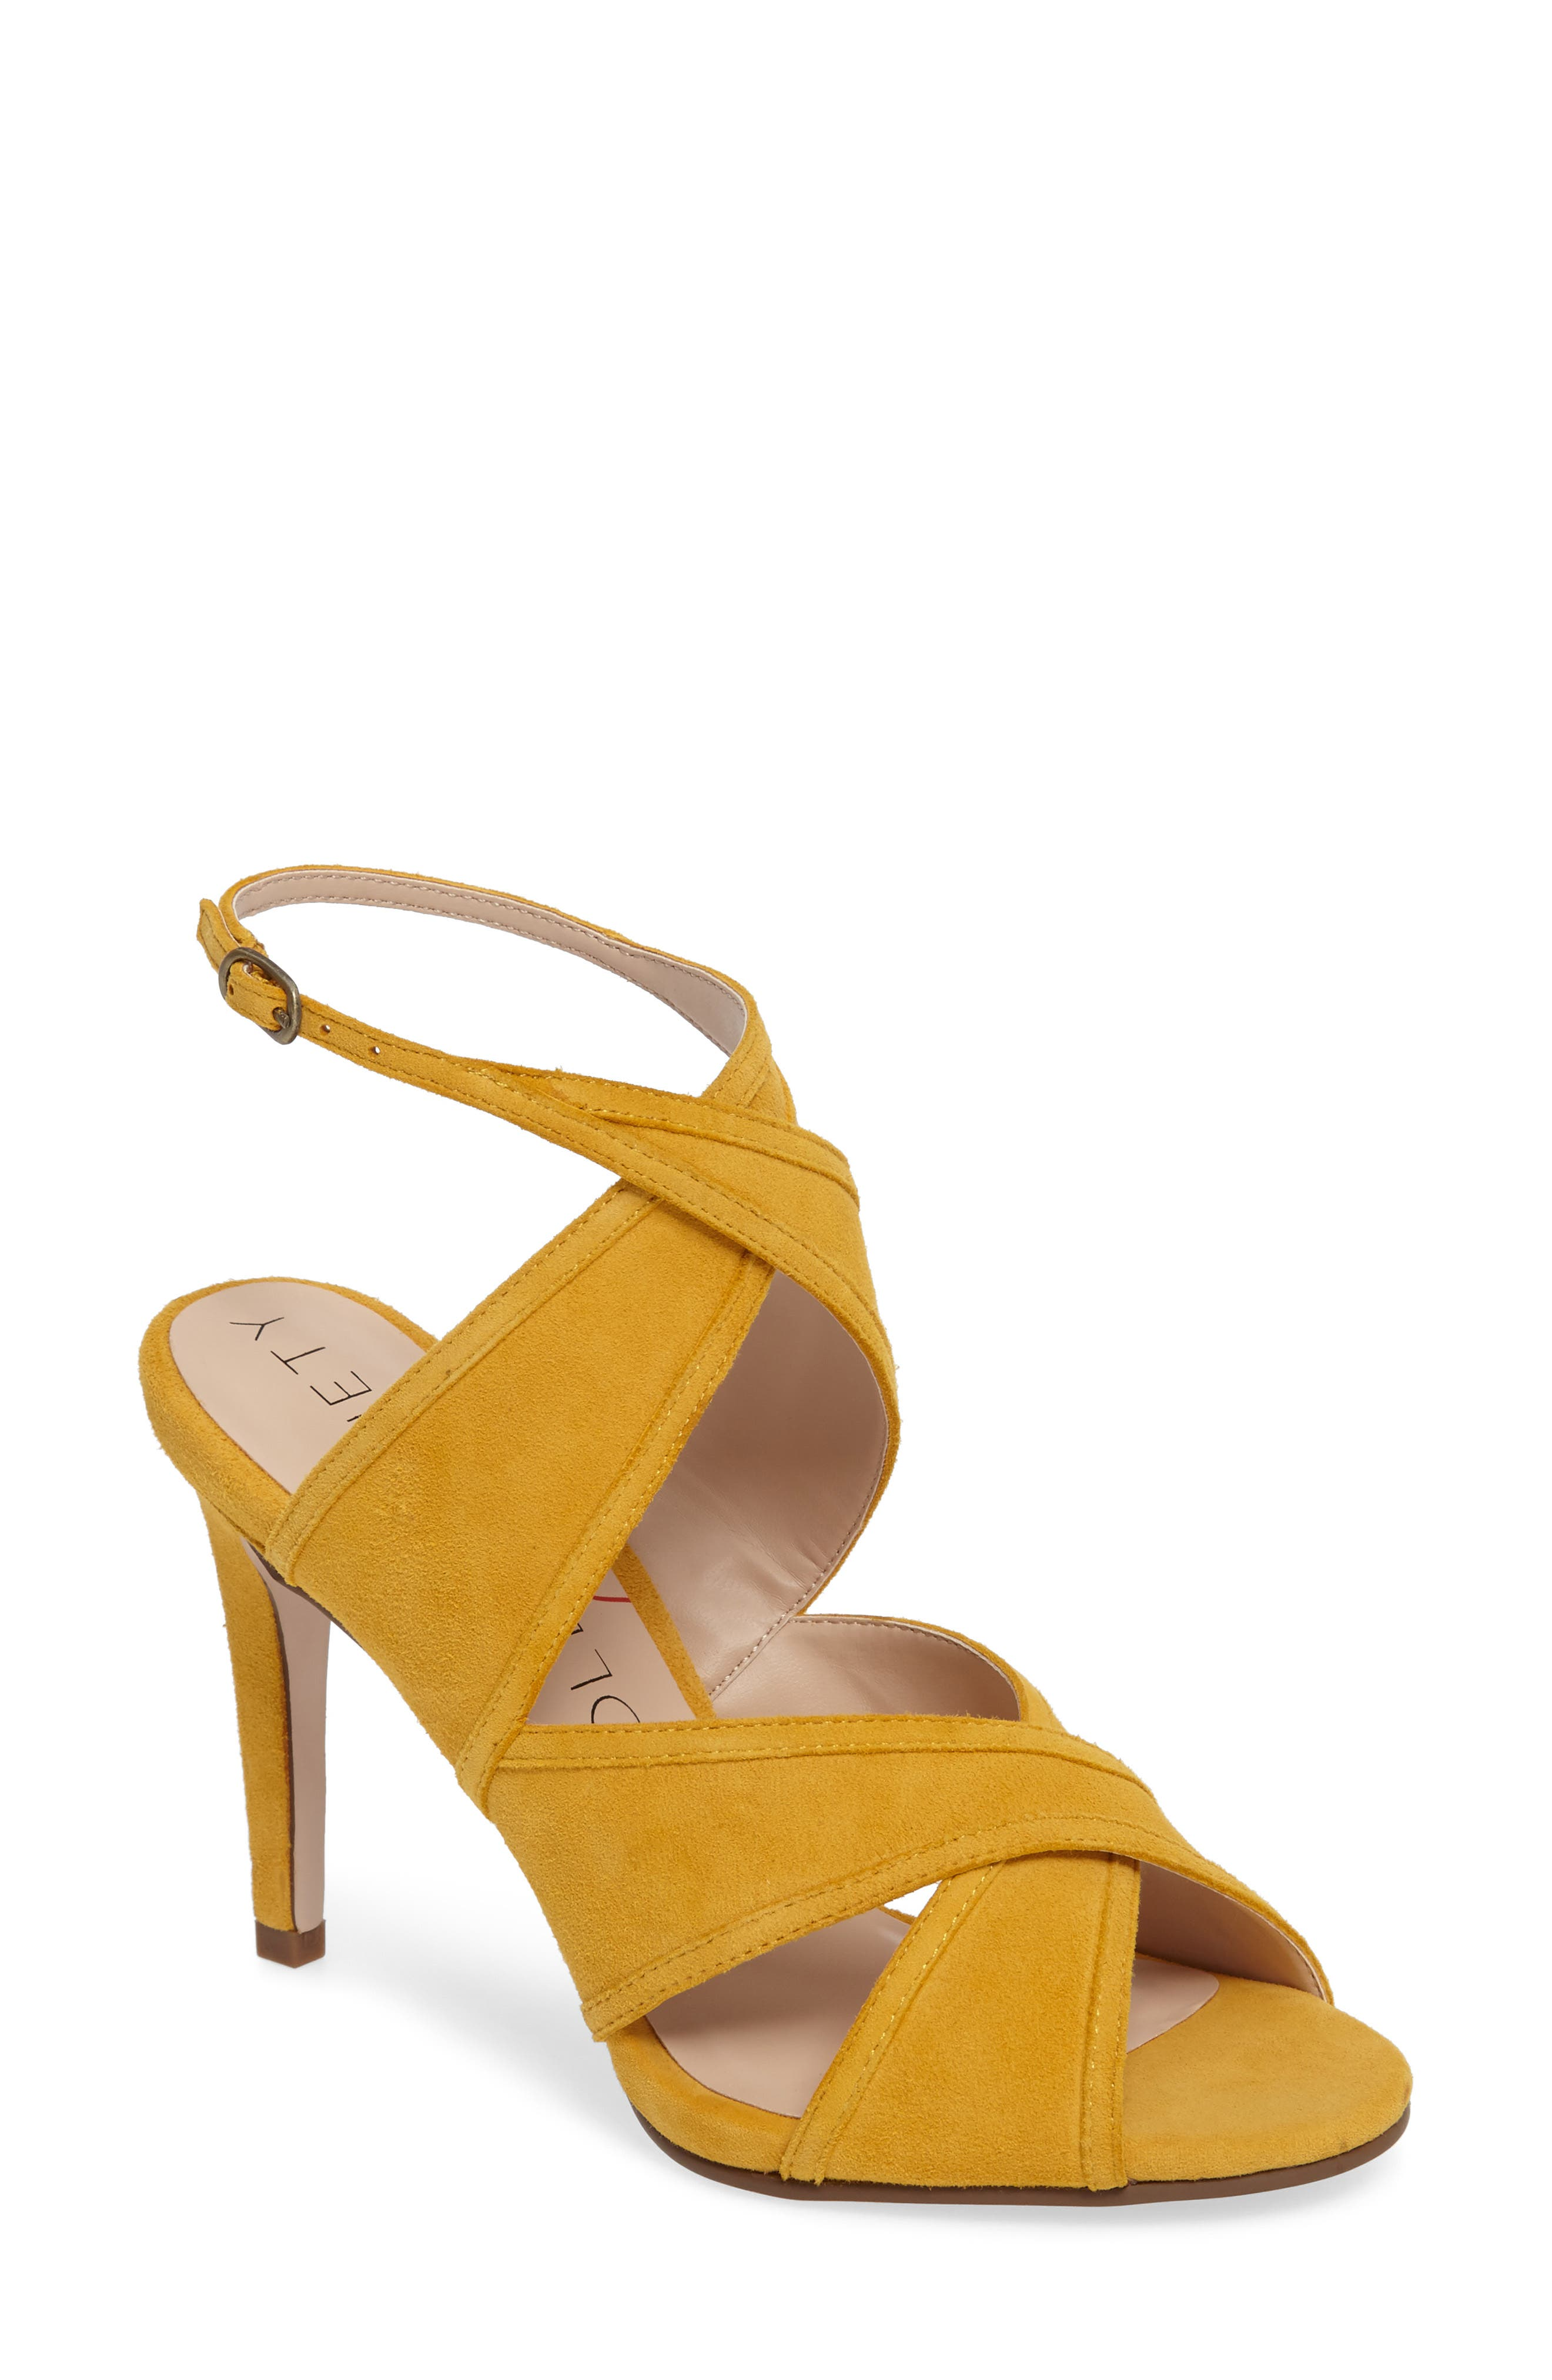 Esme Cross Strap Sandal,                         Main,                         color, Spicy Mustard Suede